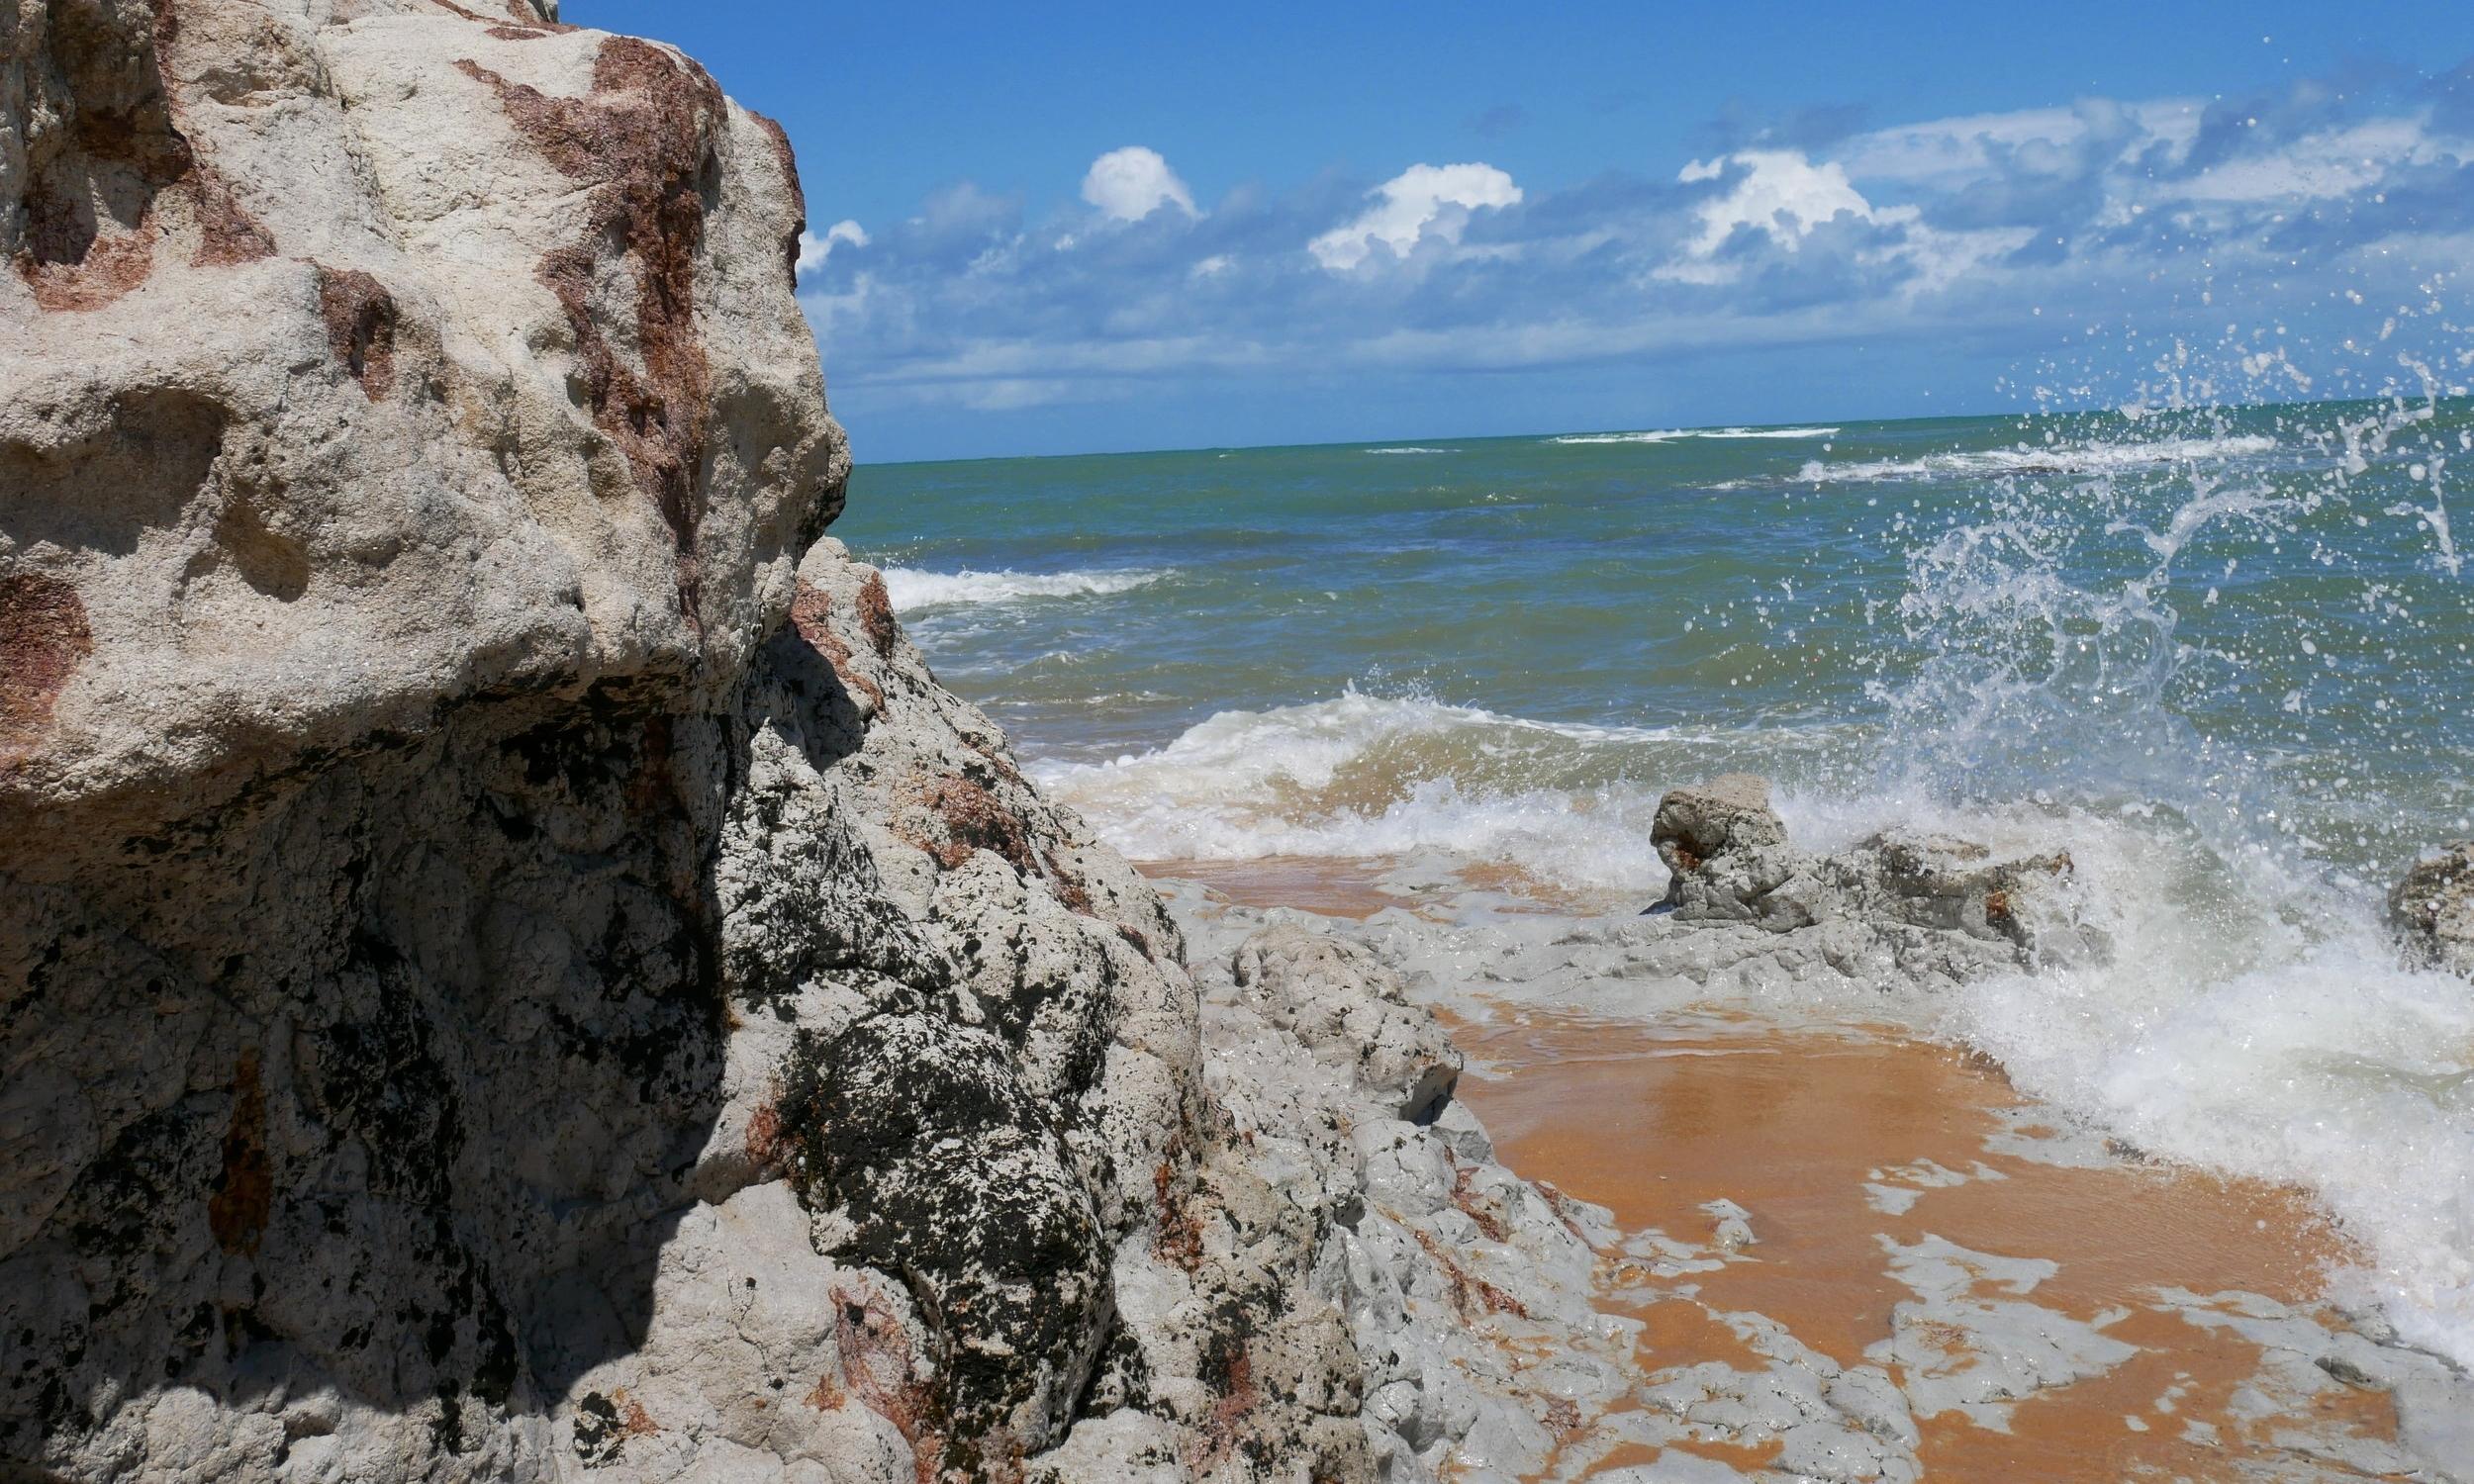 Waves crashing on the beautiful Praia do Espelho